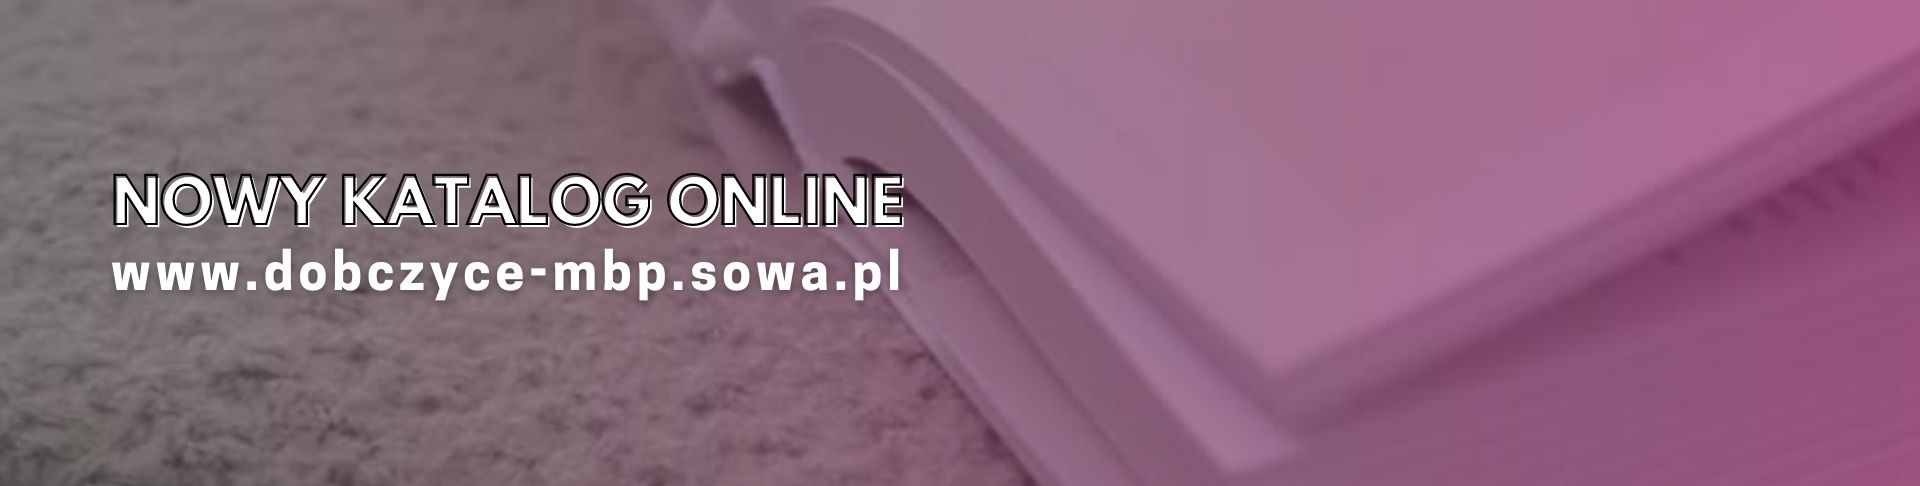 Baner: Nowy katalog online